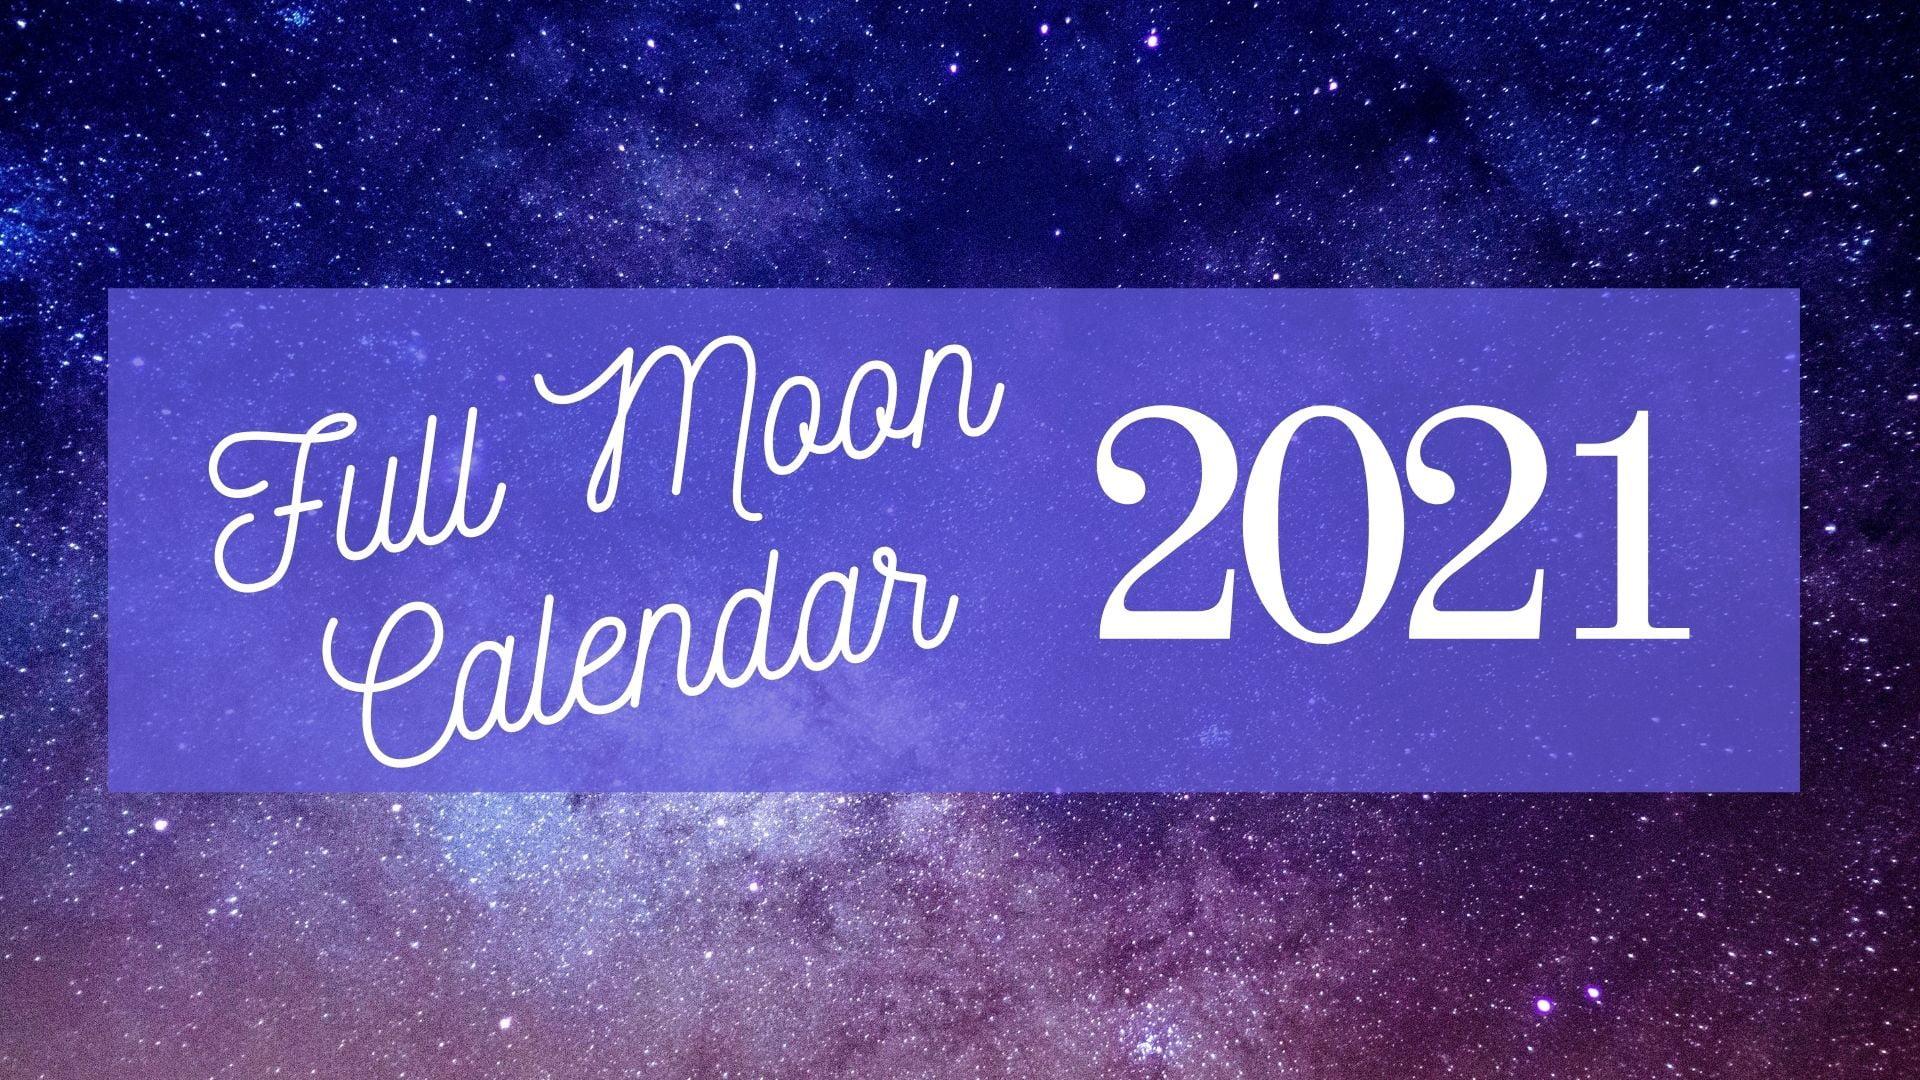 Full Moon Calendar 2021 feature image